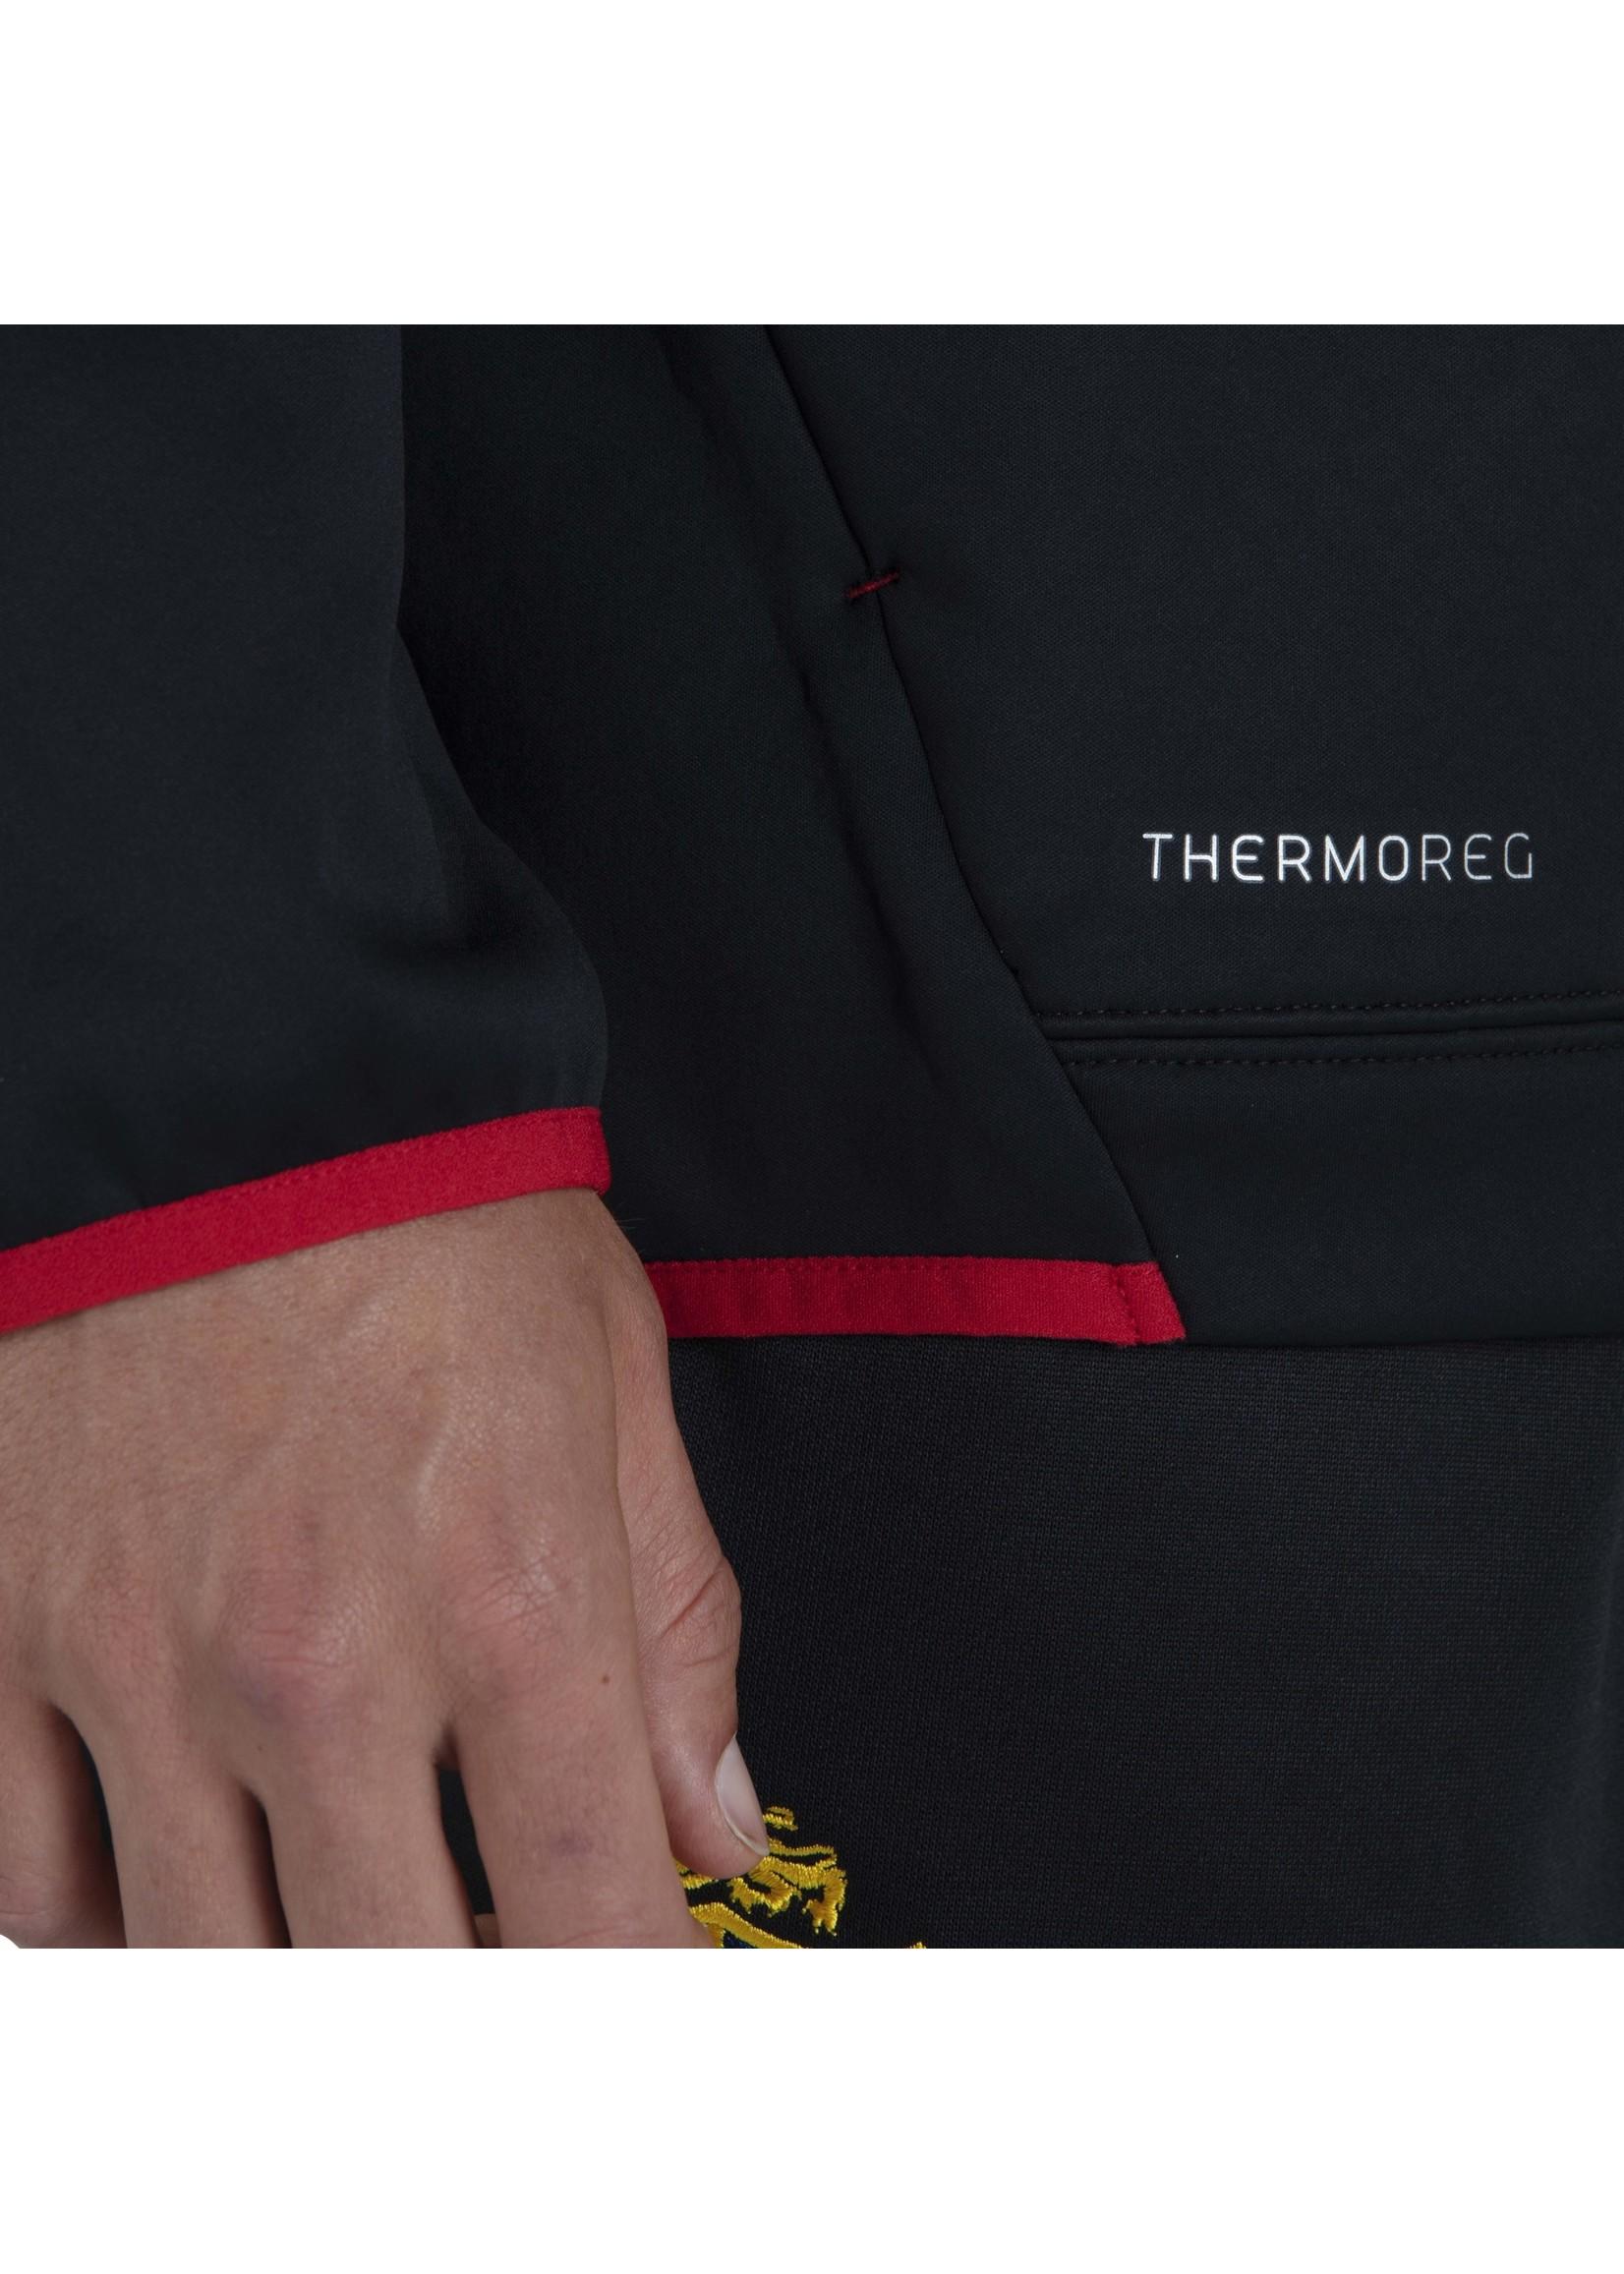 Canterbury British & Irish Lions - Mens Thermoreg Quarter Zip Fleece (2021) - Black